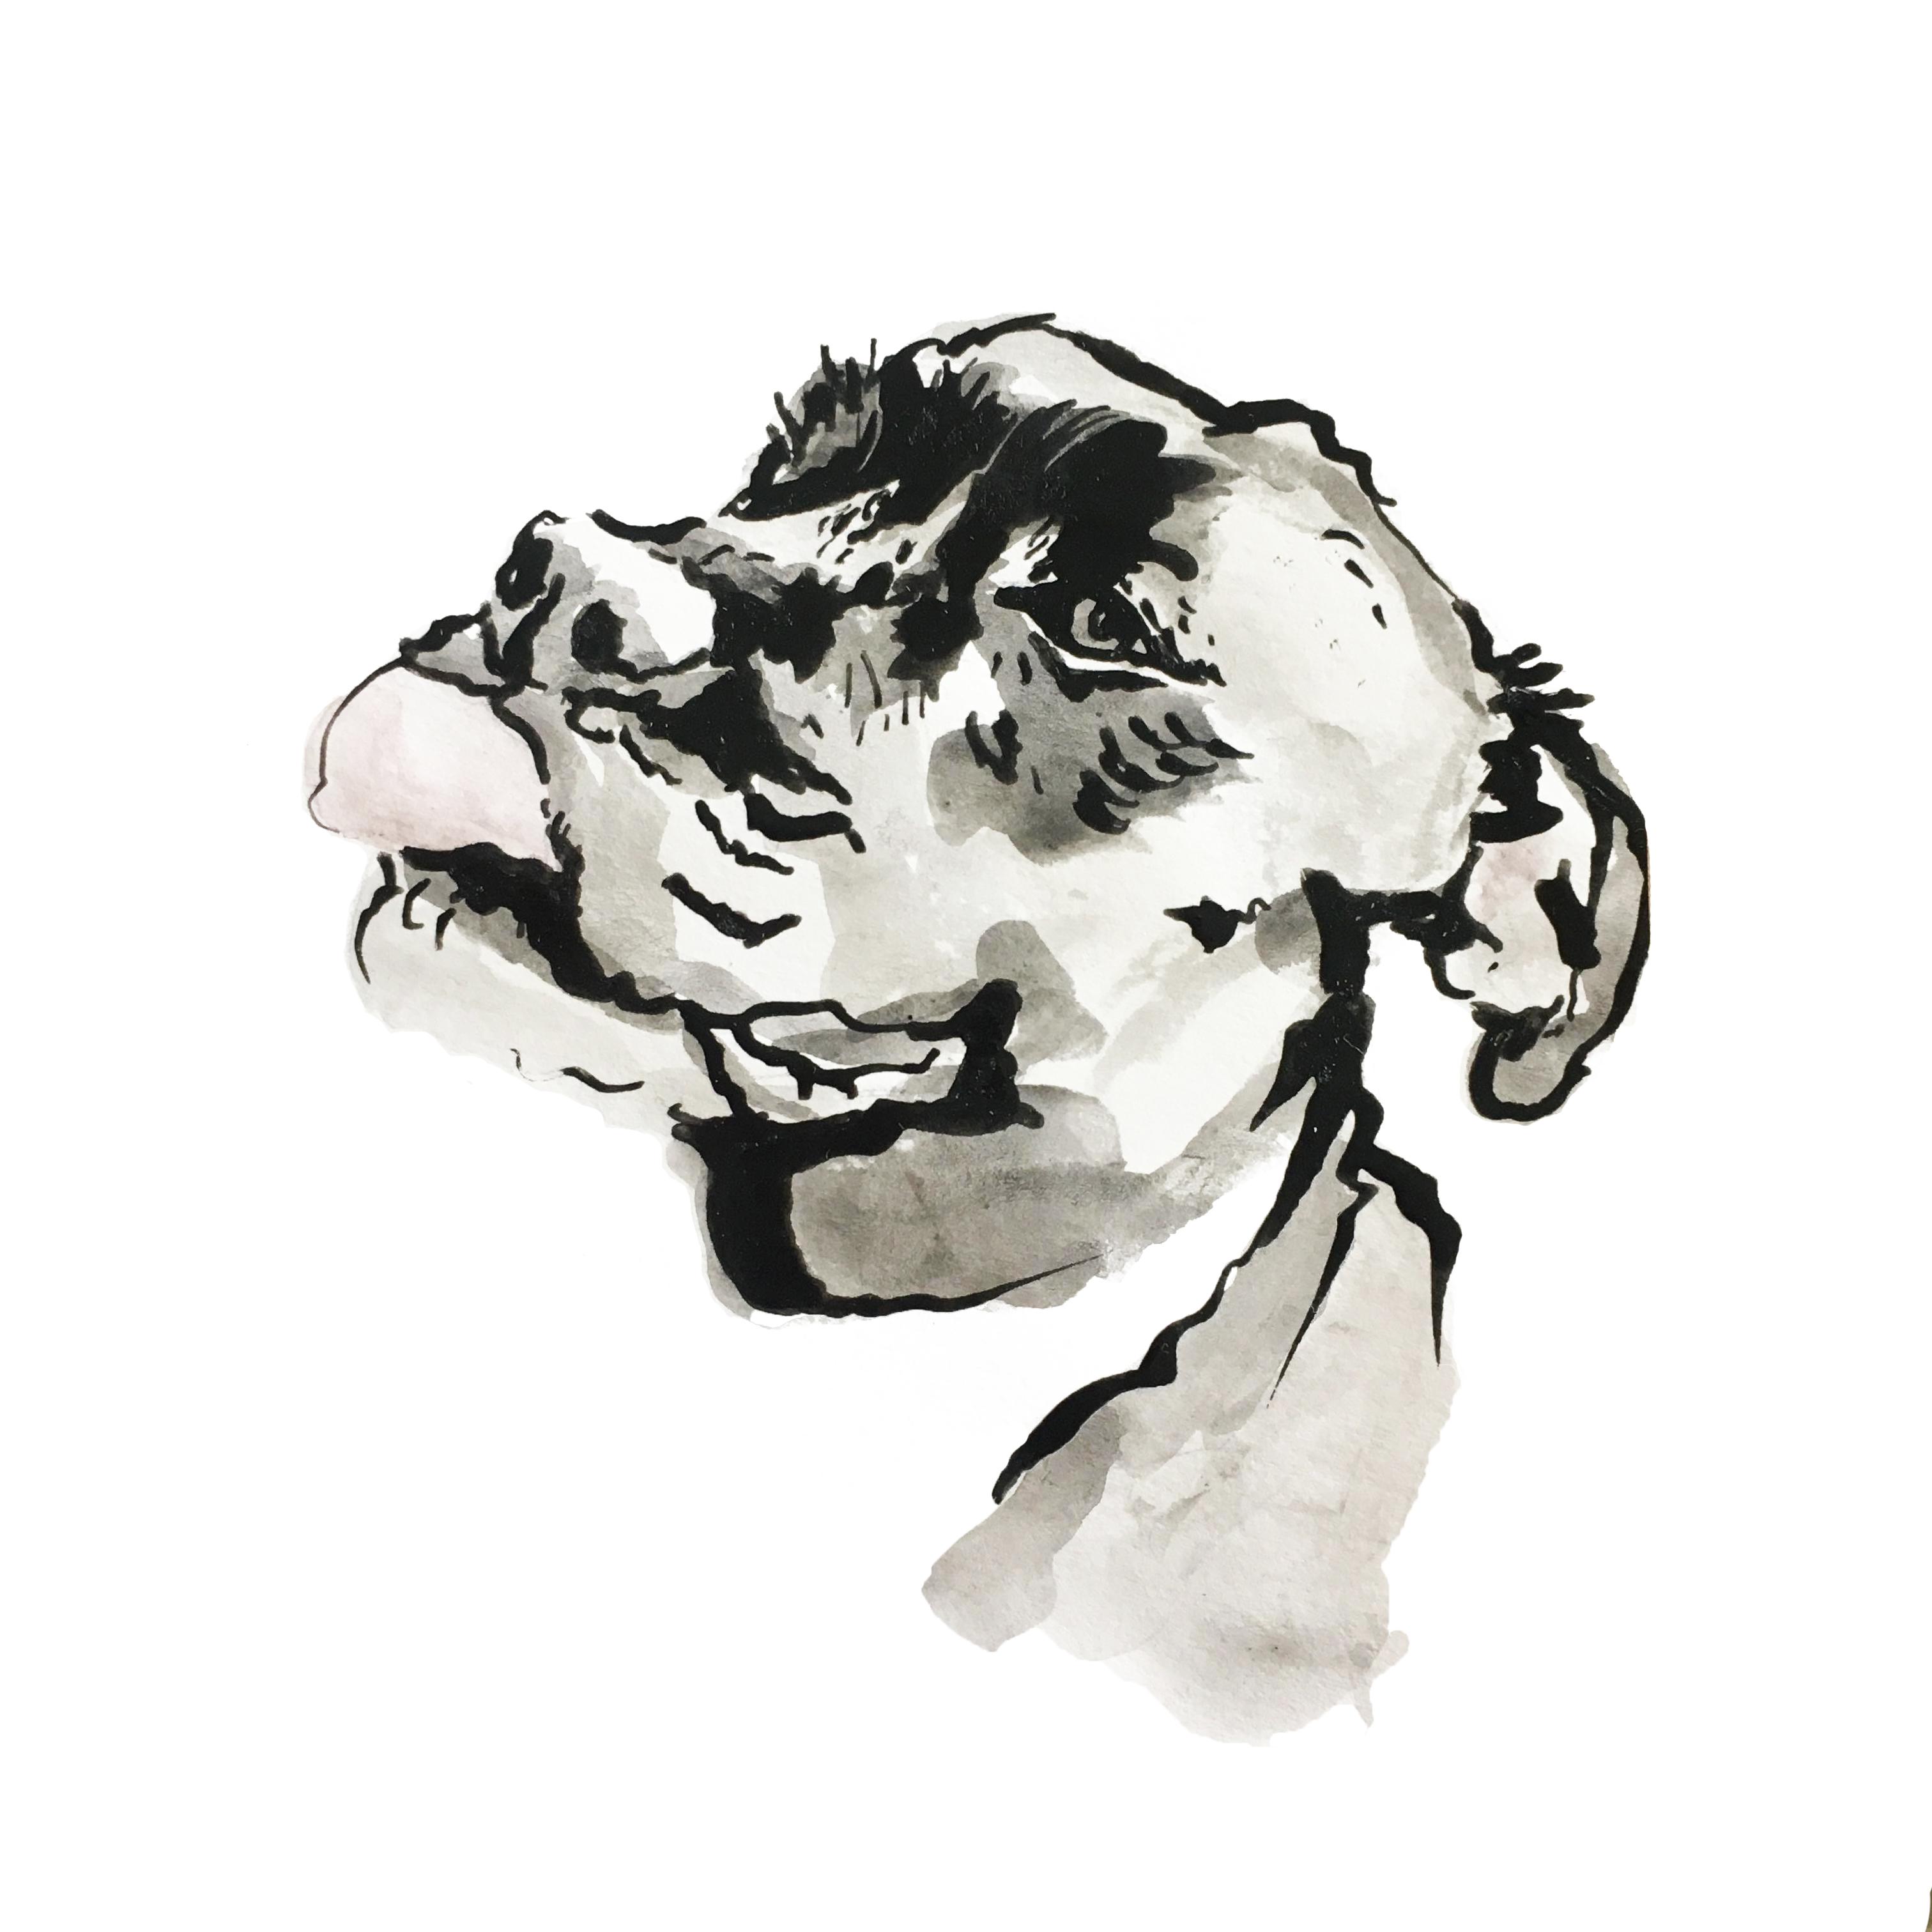 A5 (1/3)